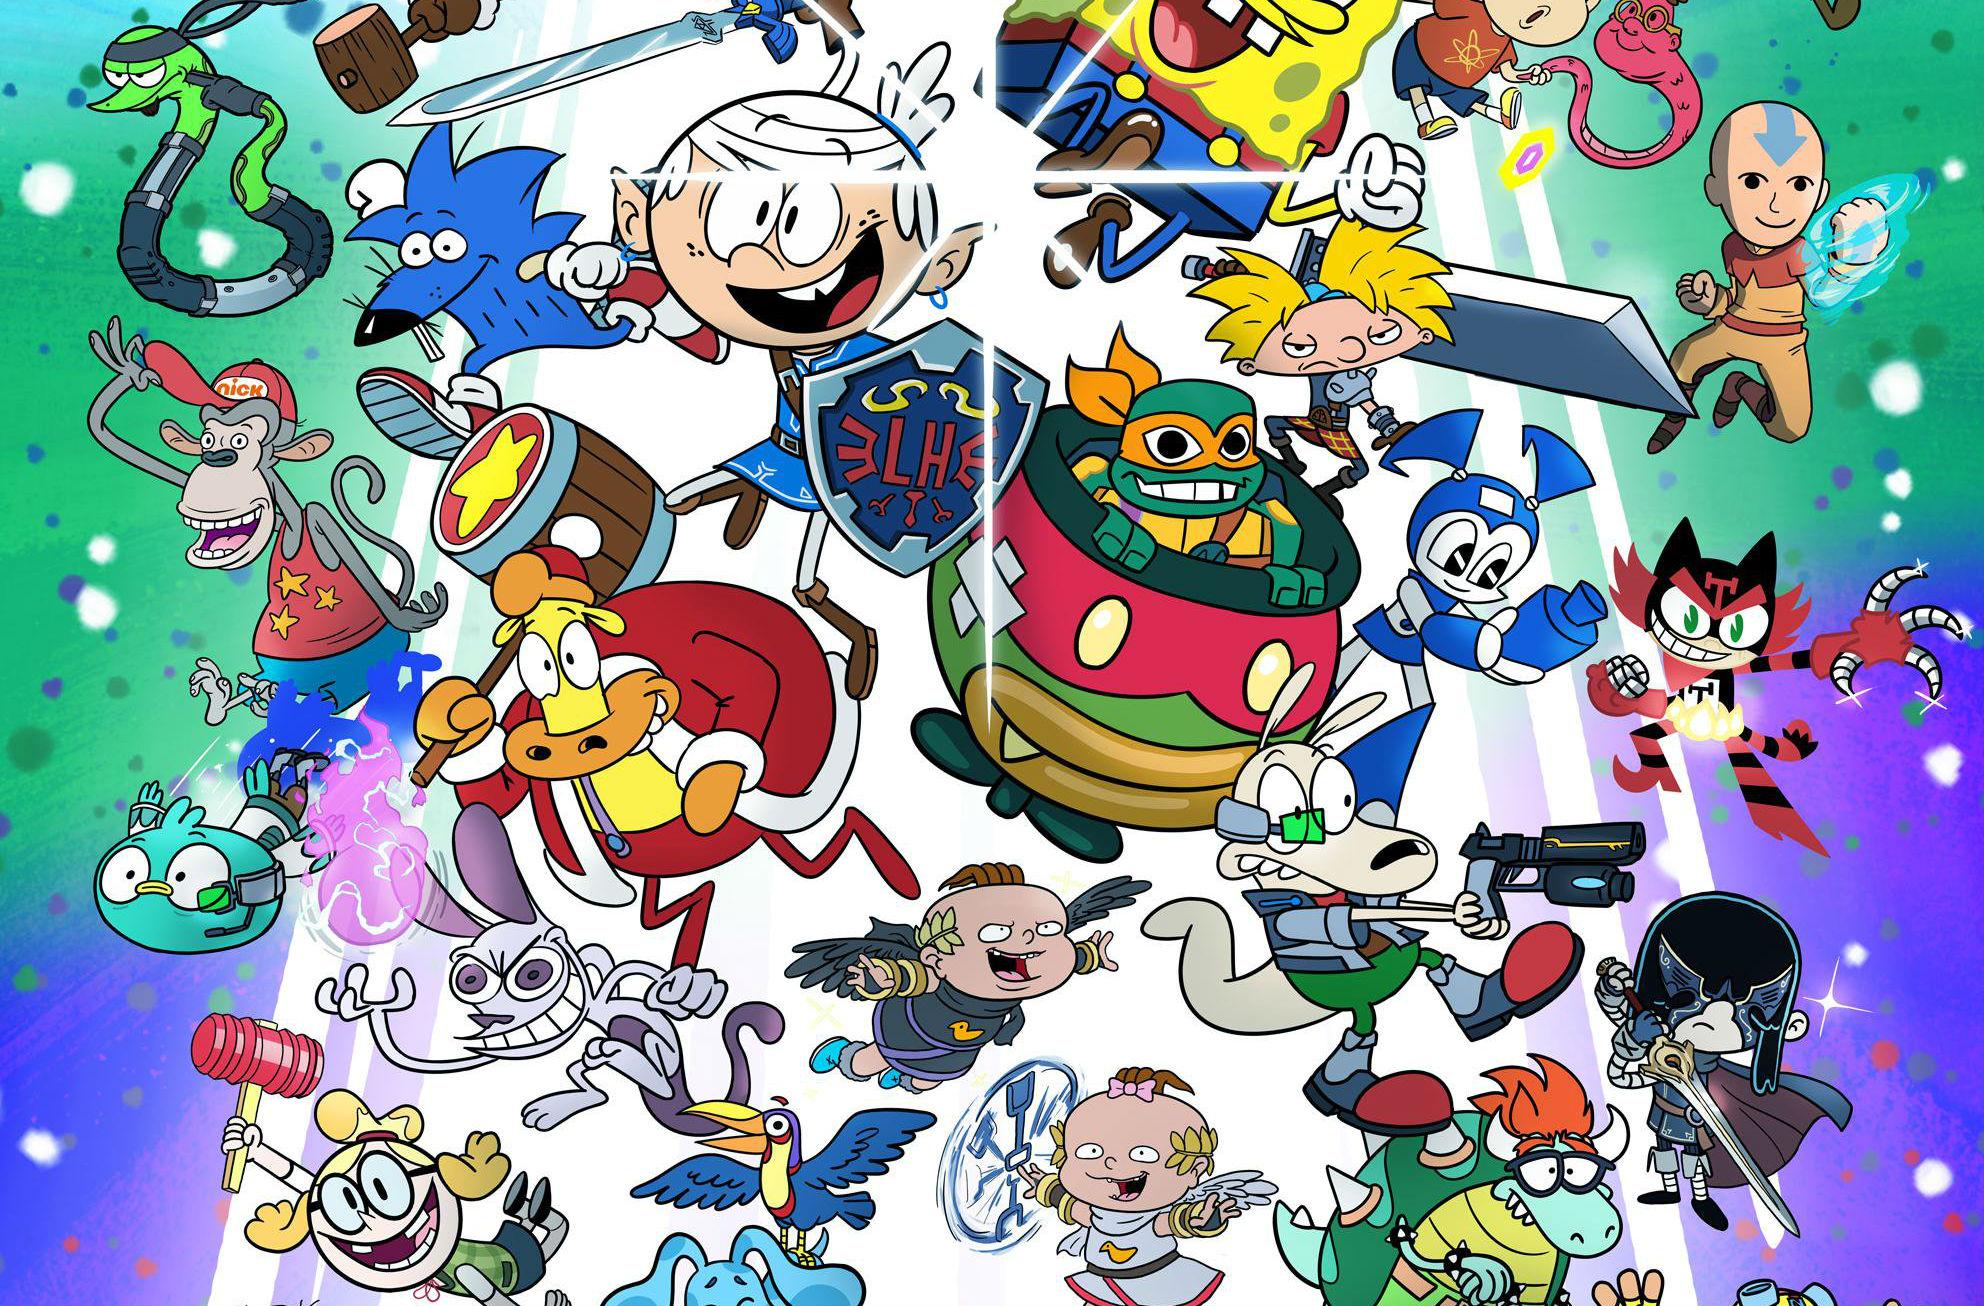 Official Nickelodeon artists made this Nick Cartoon Smash Bros. mashup poster